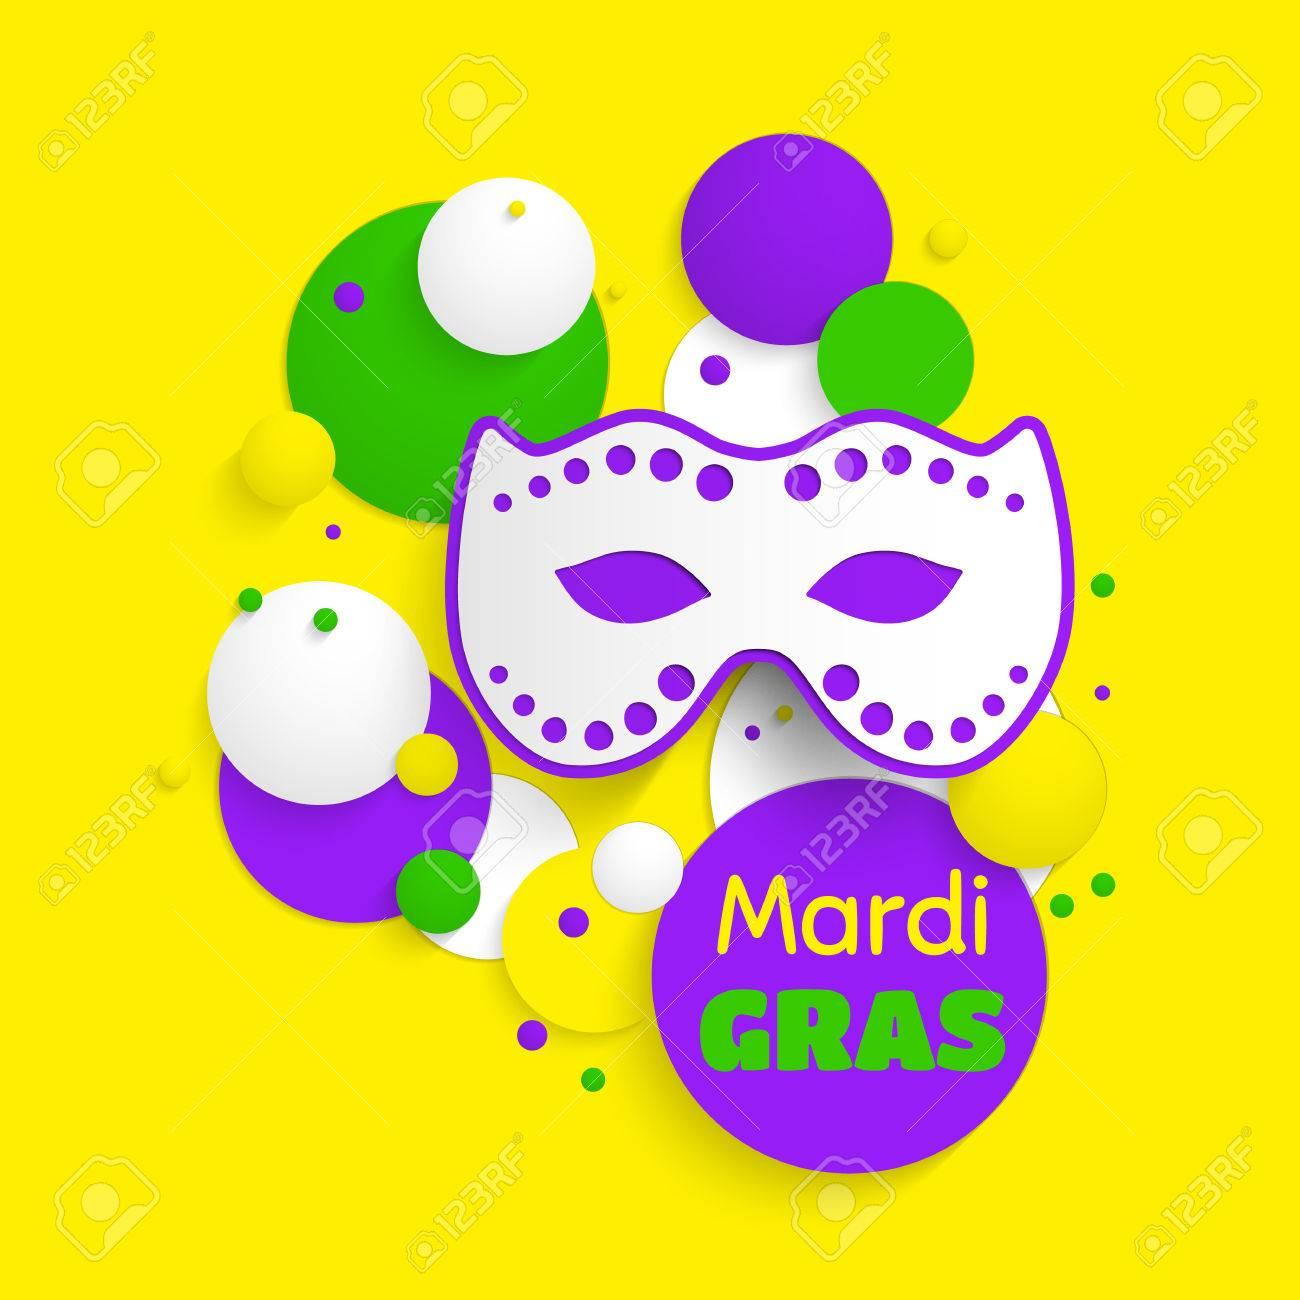 Mardi Gras Party Poster Design. Template Of Invitation, Flyer ...